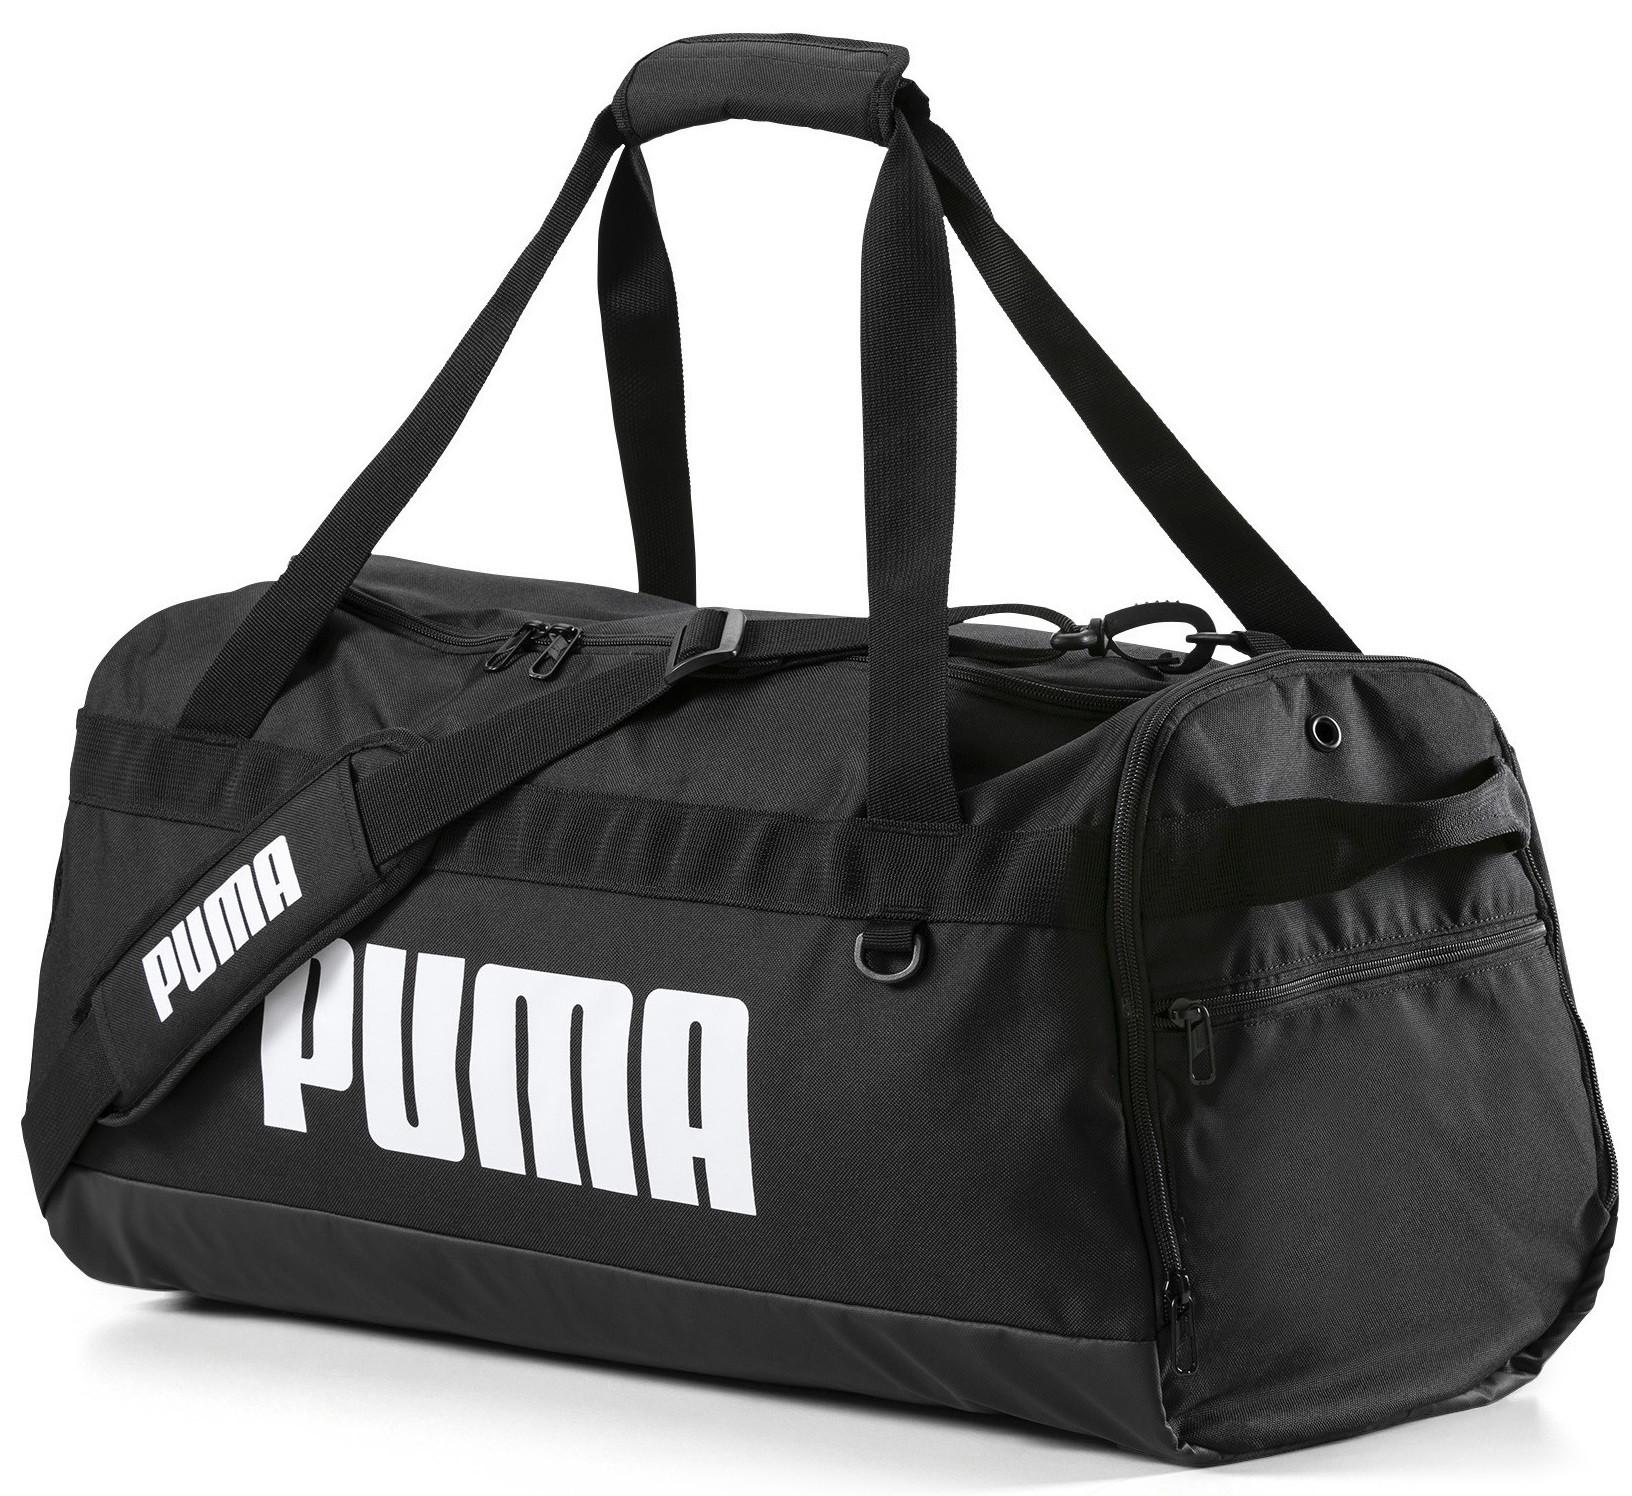 f4dcd8a537f6a Puma Challenger Duffel Bag Black | Sportsman24